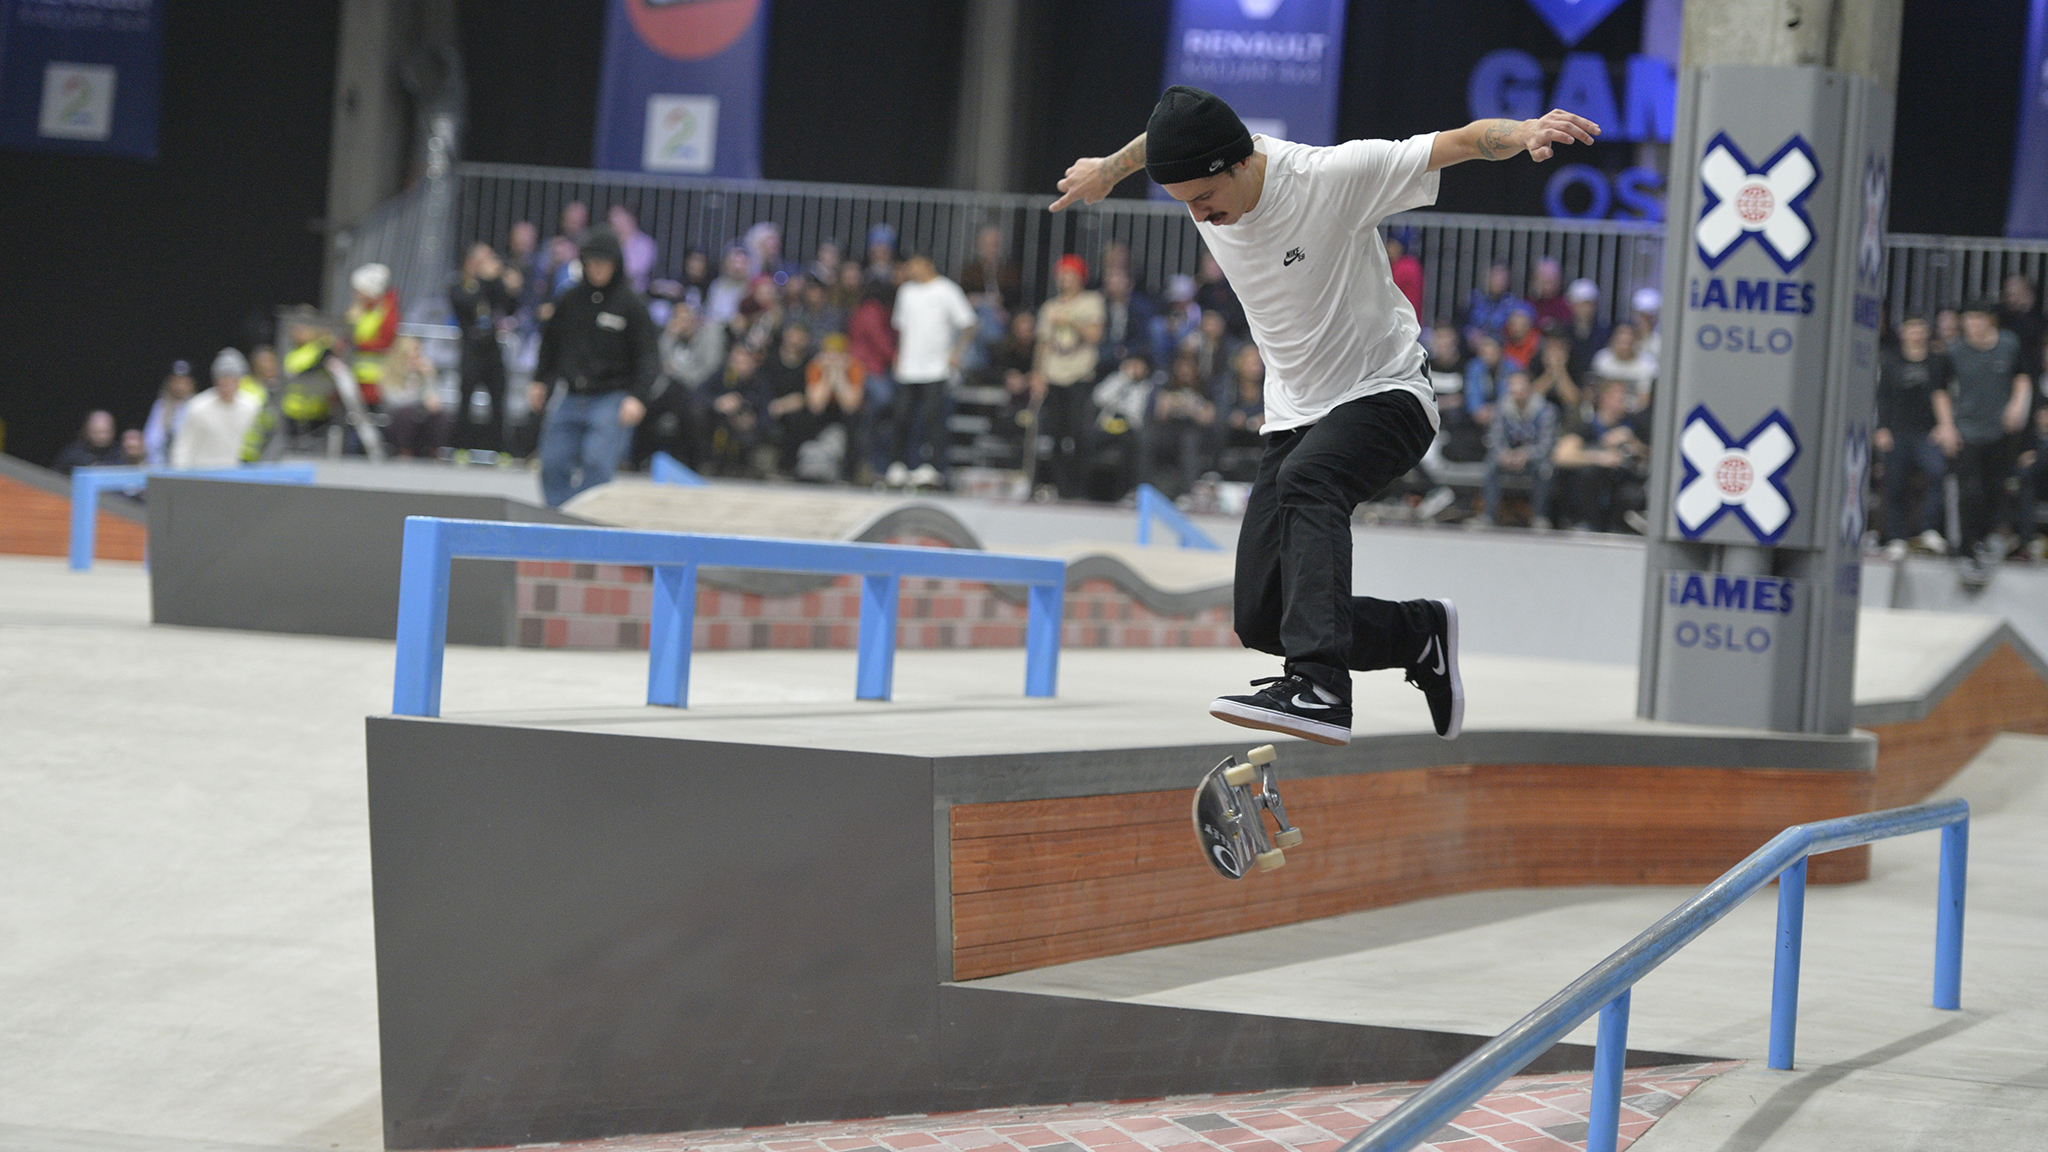 Roller skating x games - Roller Skating X Games 5